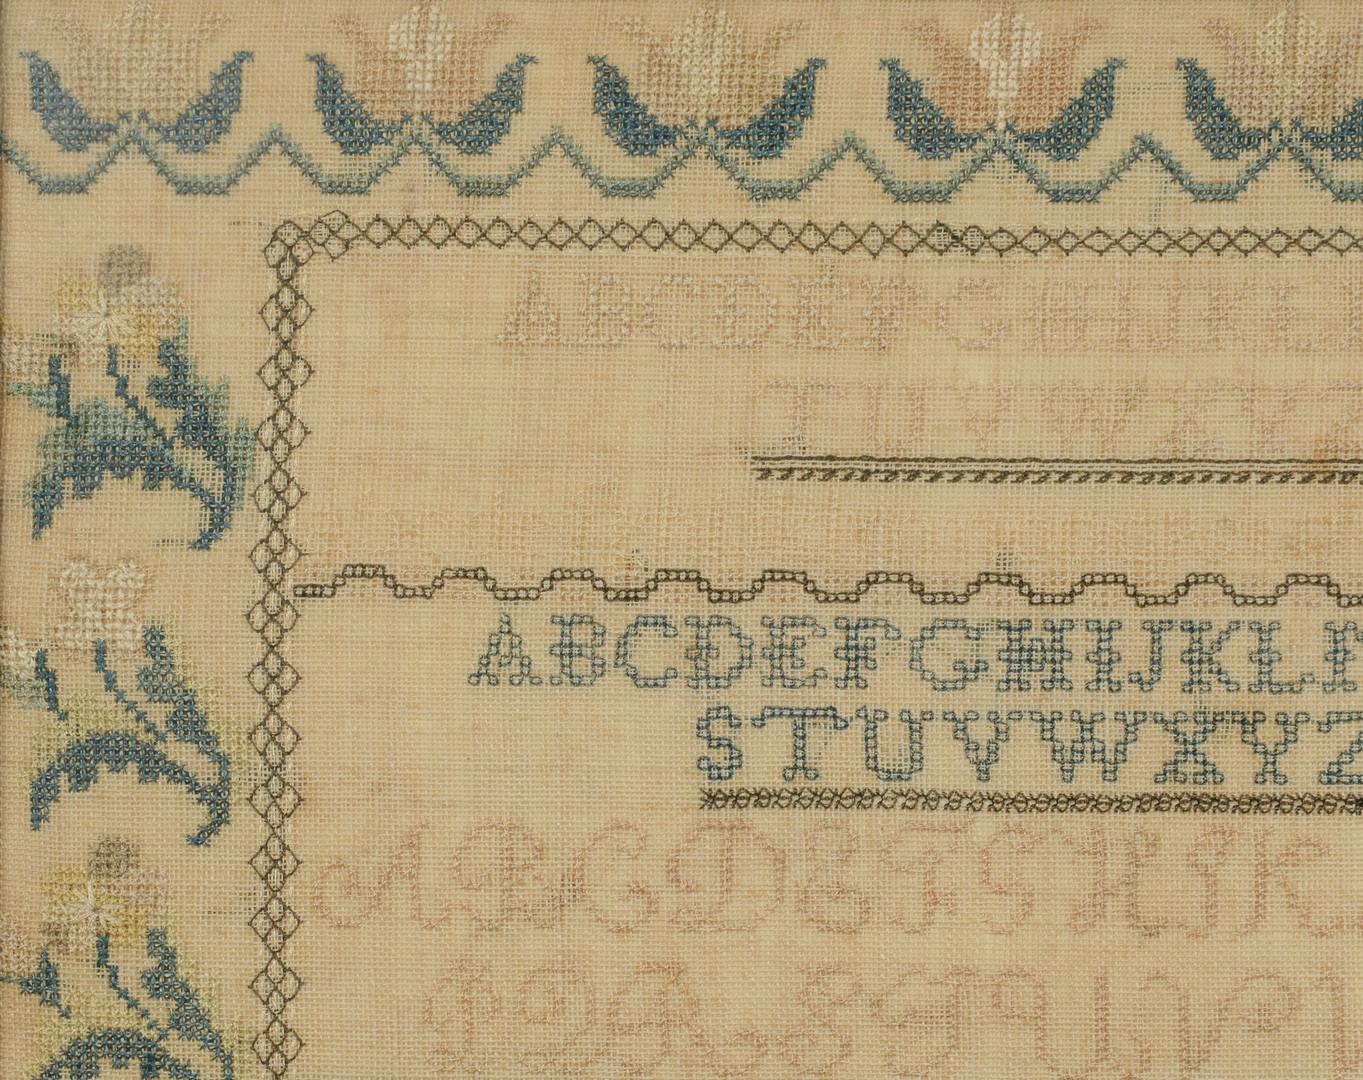 Lot 165: Tennessee Needlework Sampler 1839, Roxana McGee